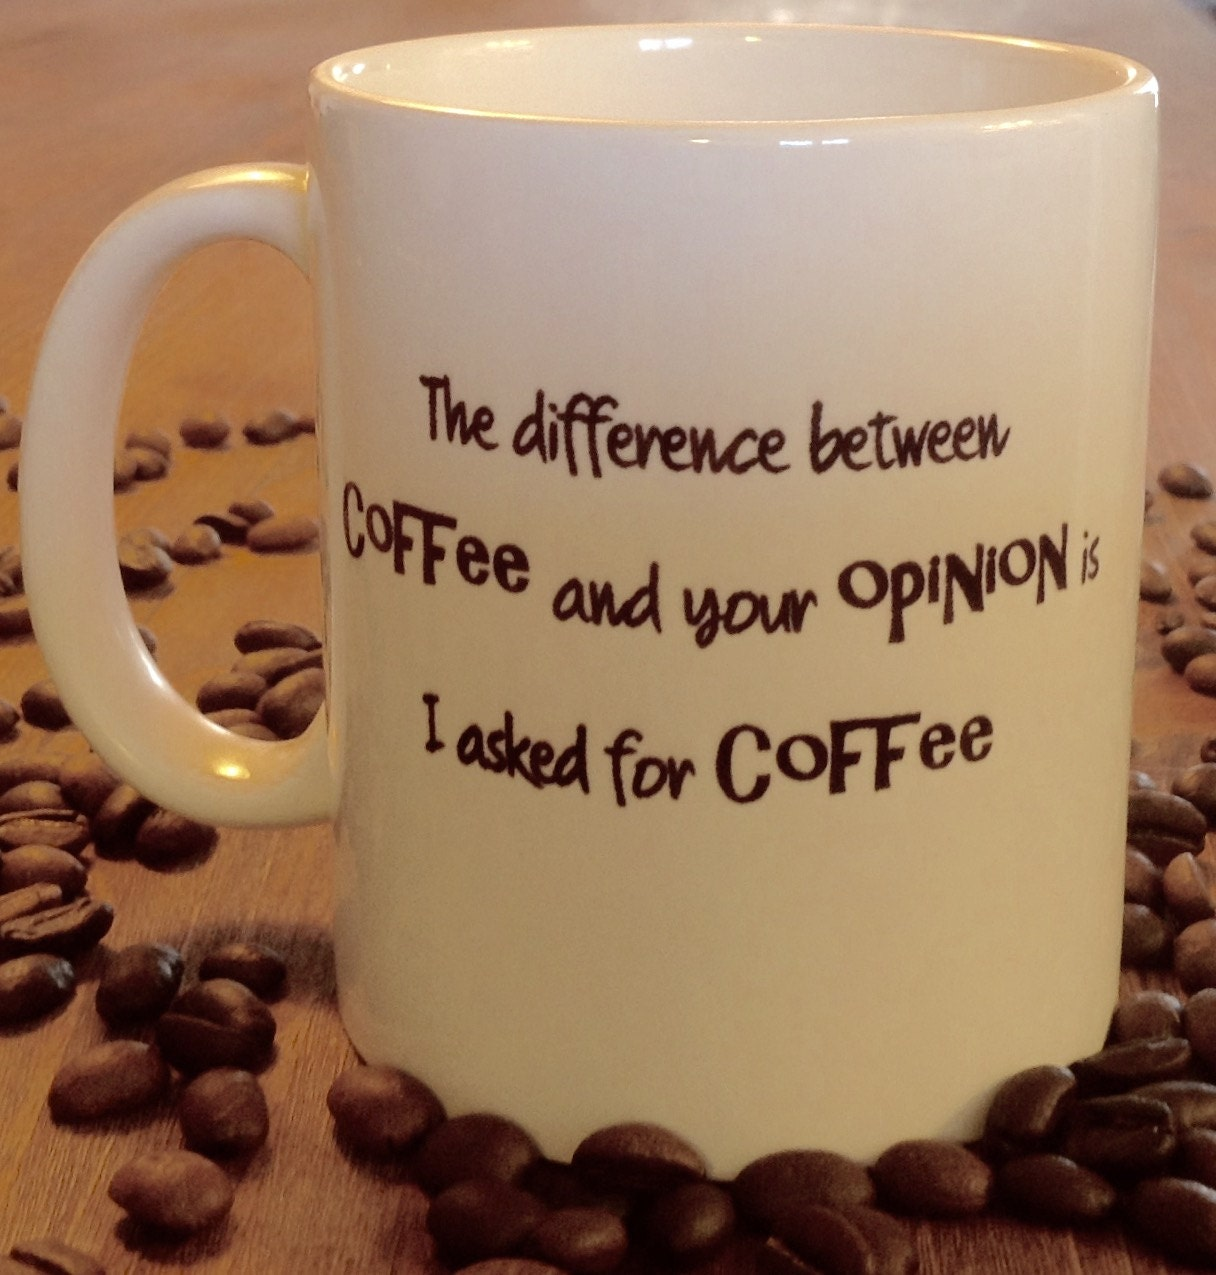 Funny coffee mug gift mugs office coffee mug gift for boss - Funny office coffee mugs ...